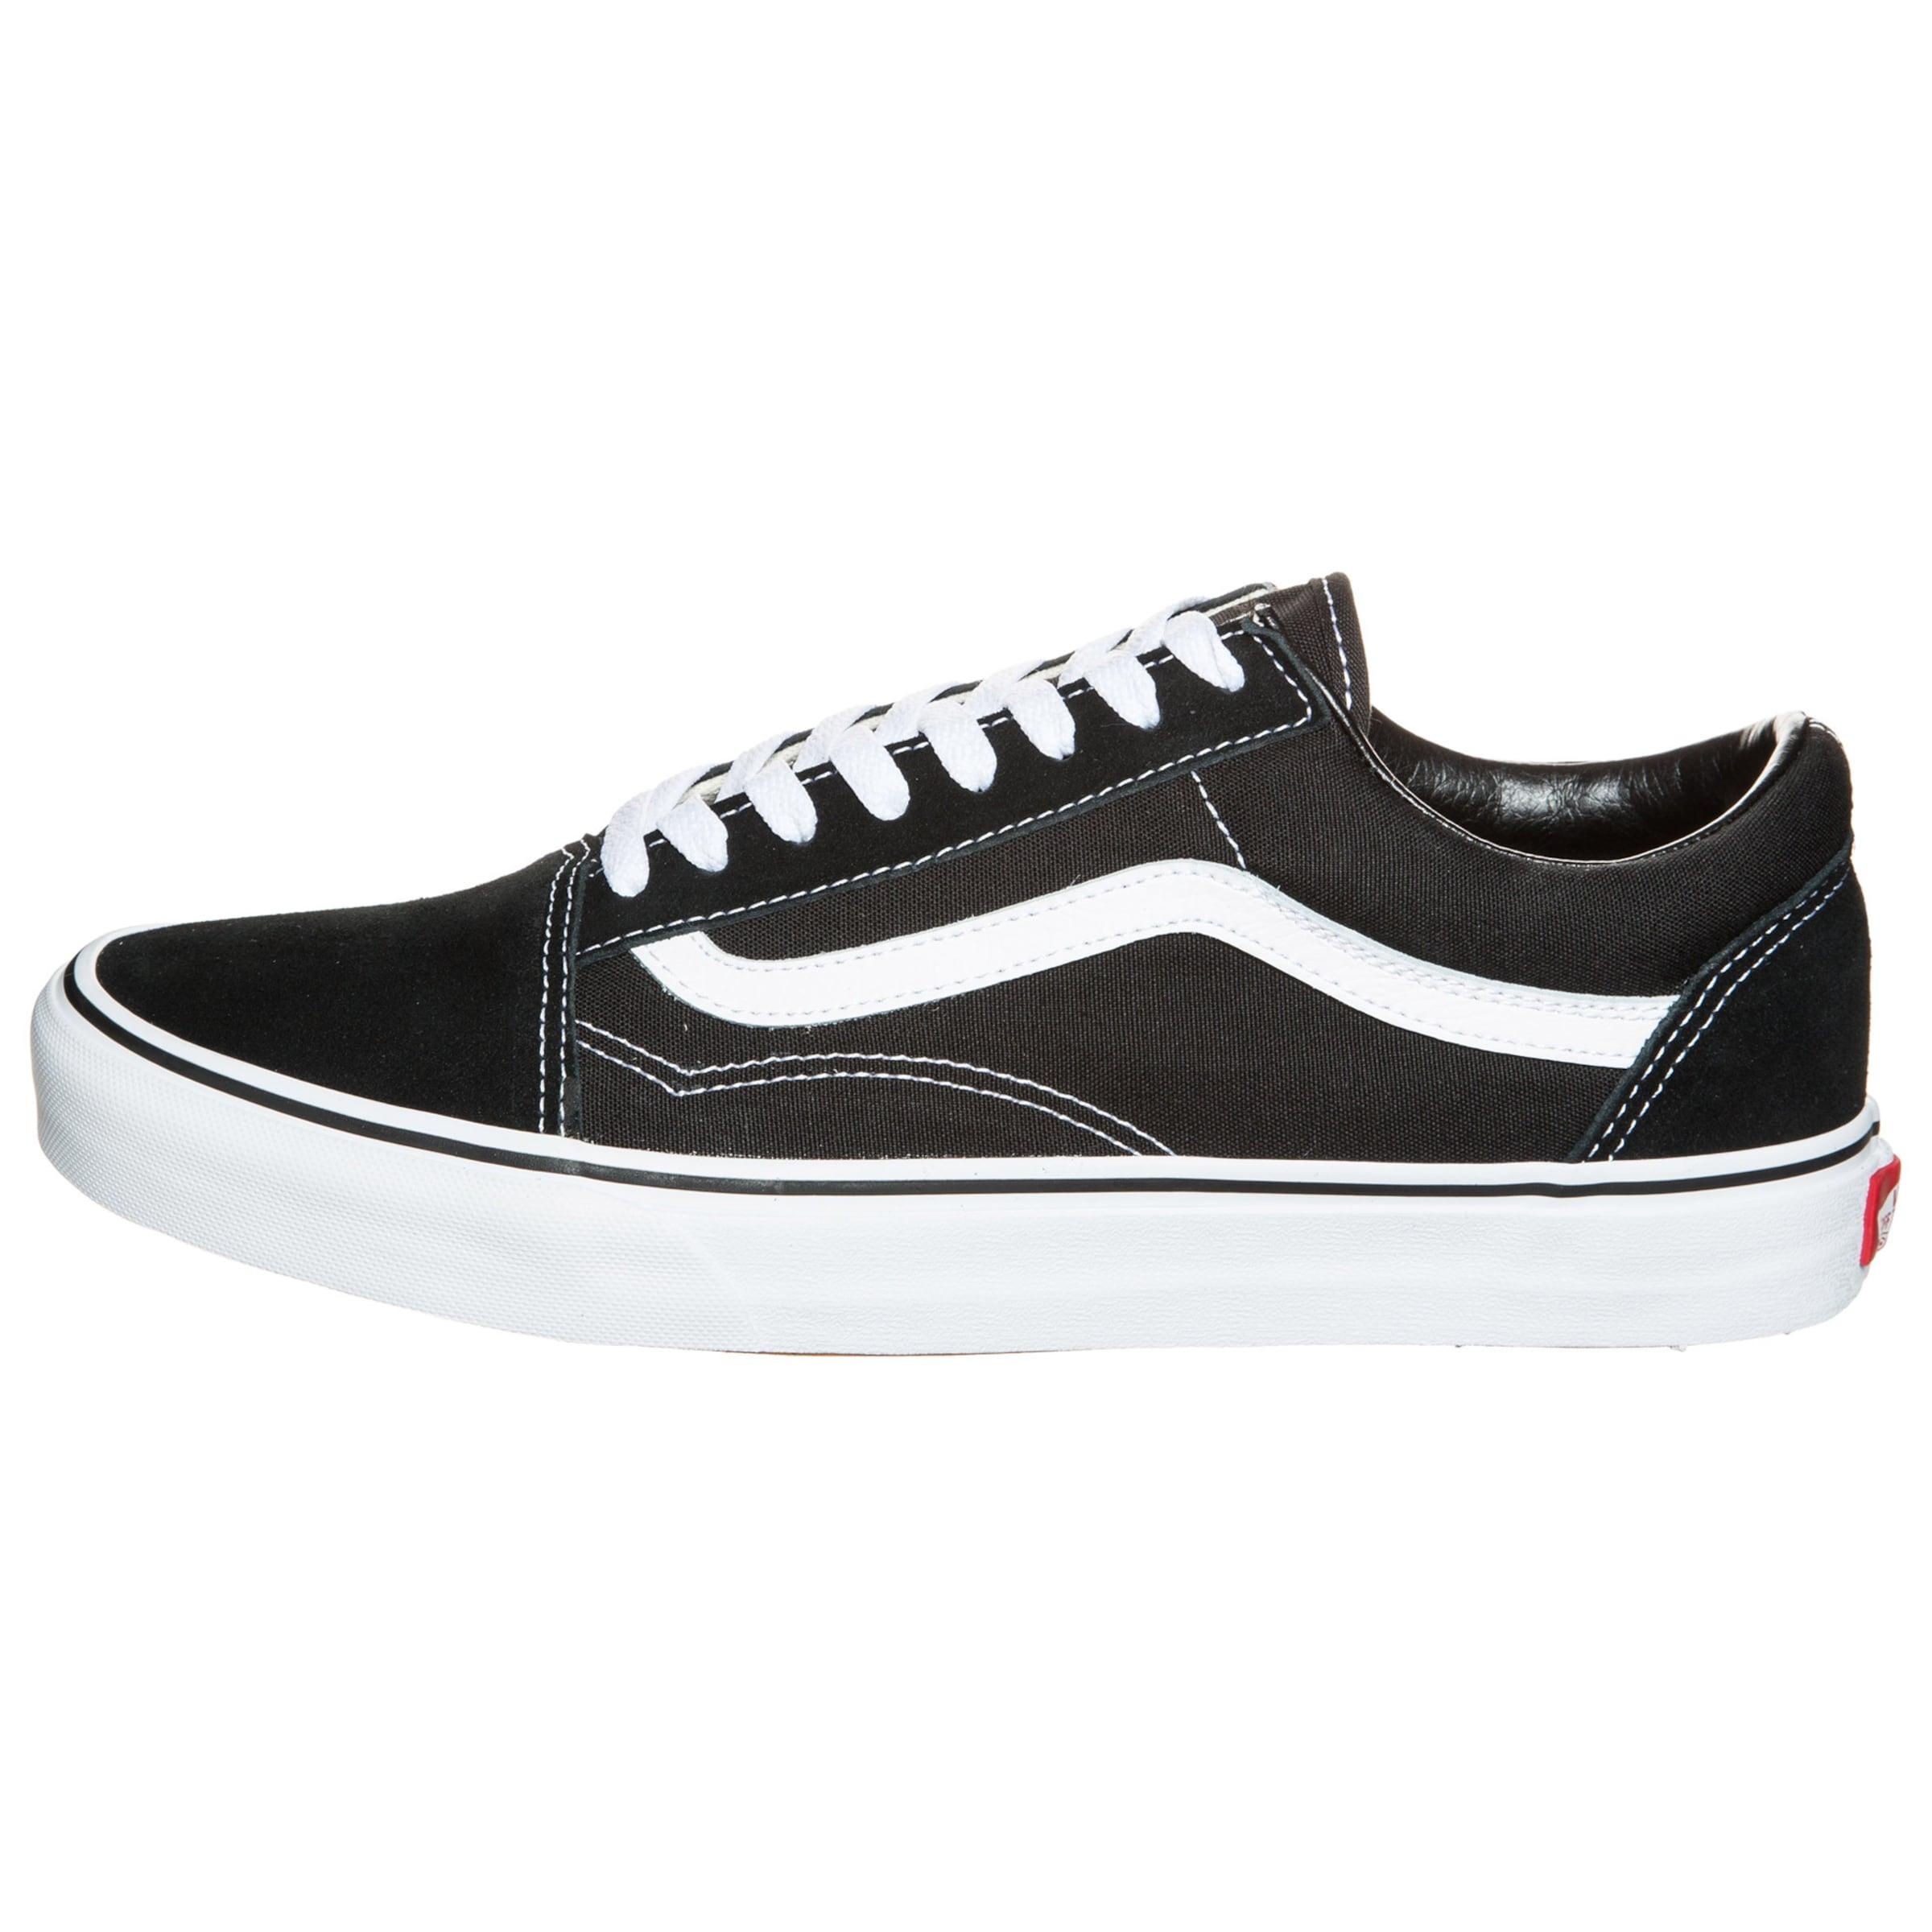 Vans Old In Skool Schwarz Sneaker 1lFKcJT